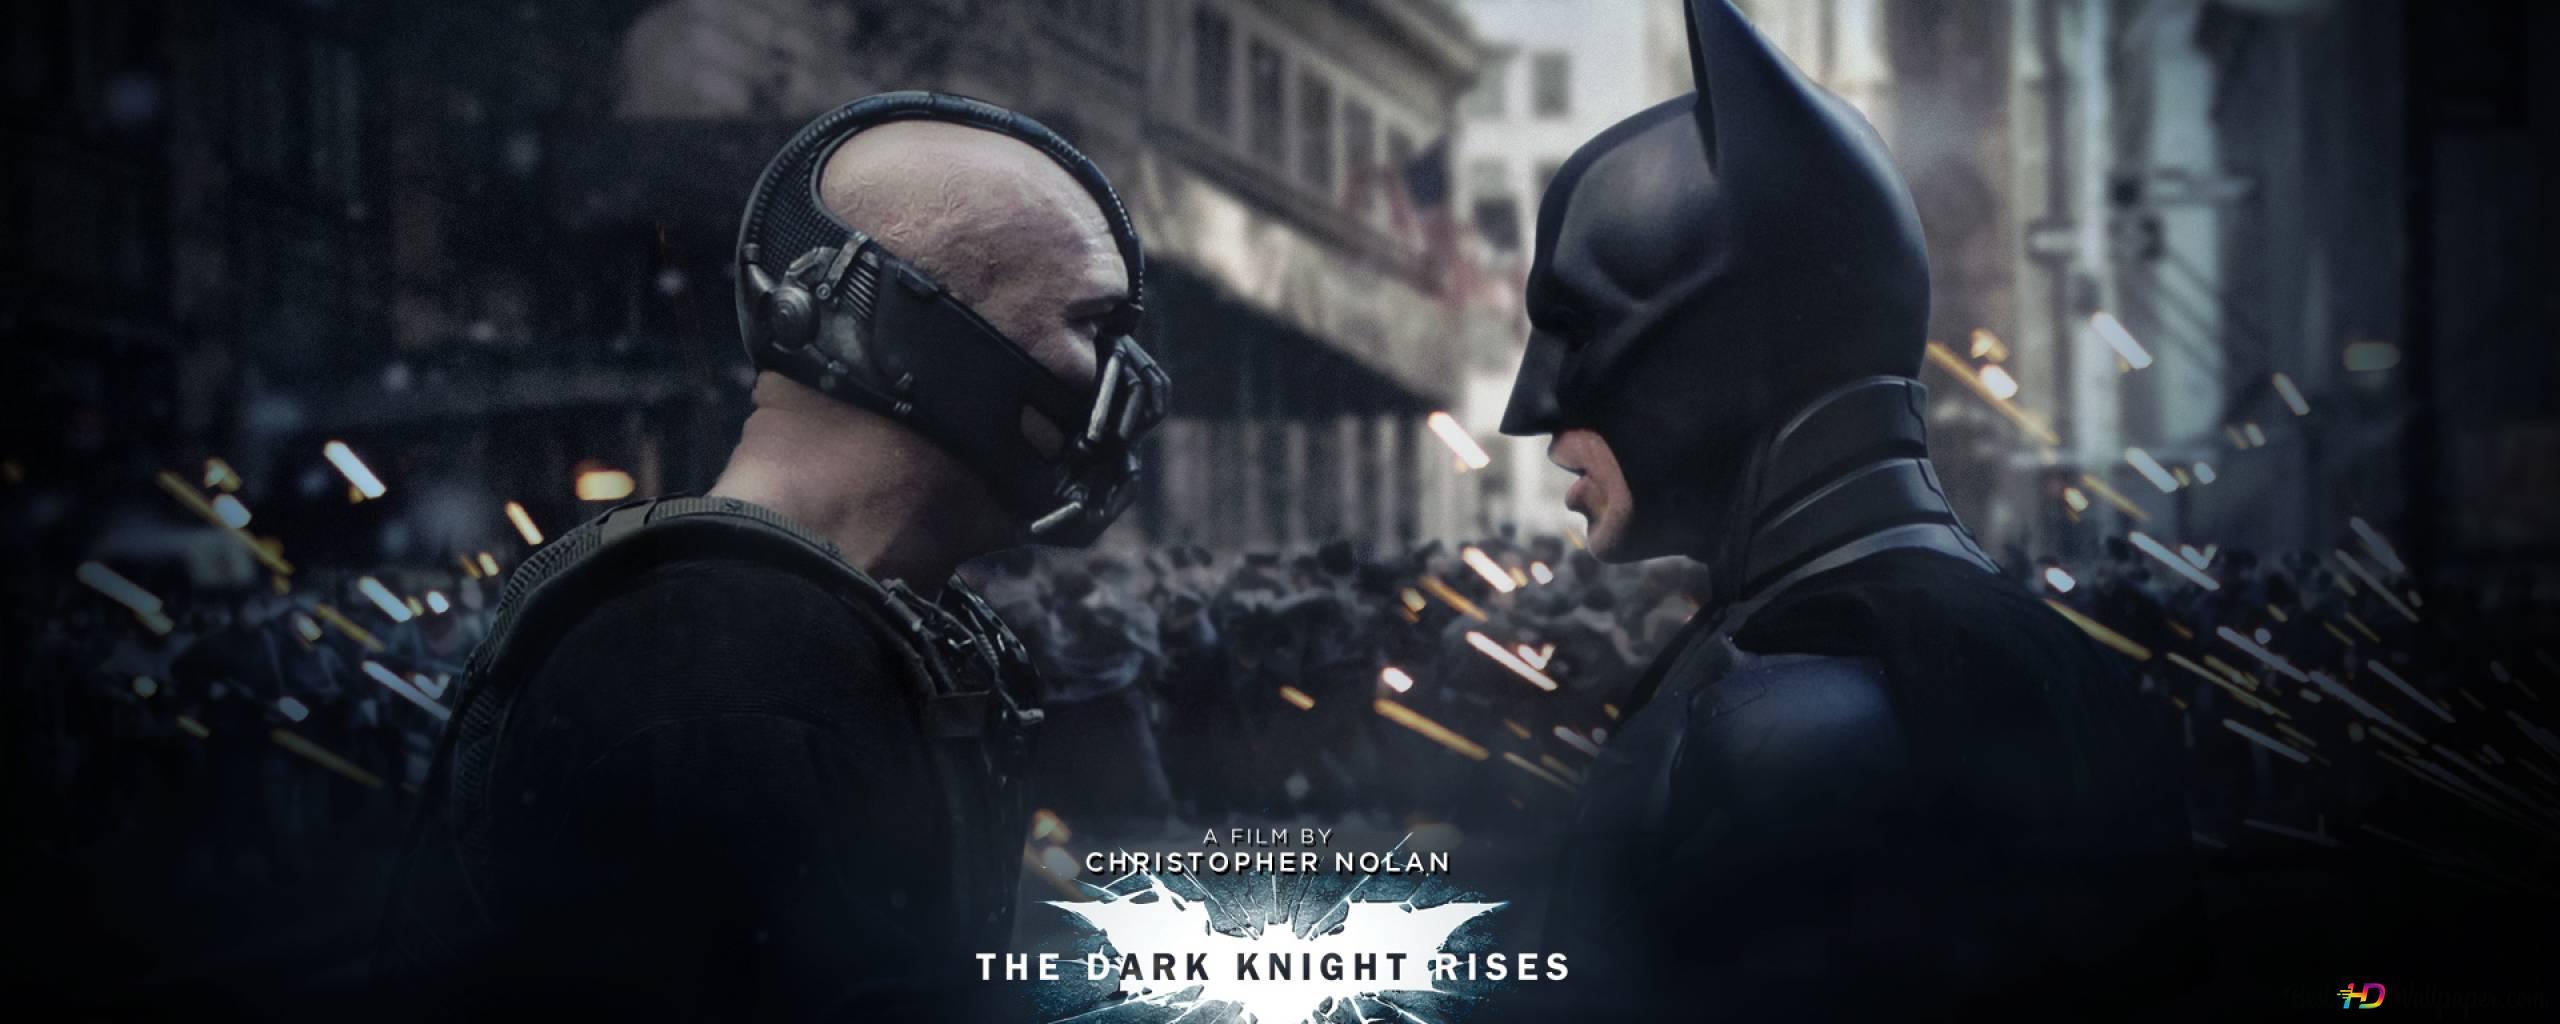 The Dark Knight Rises Poster Film Unduhan Wallpaper Hd